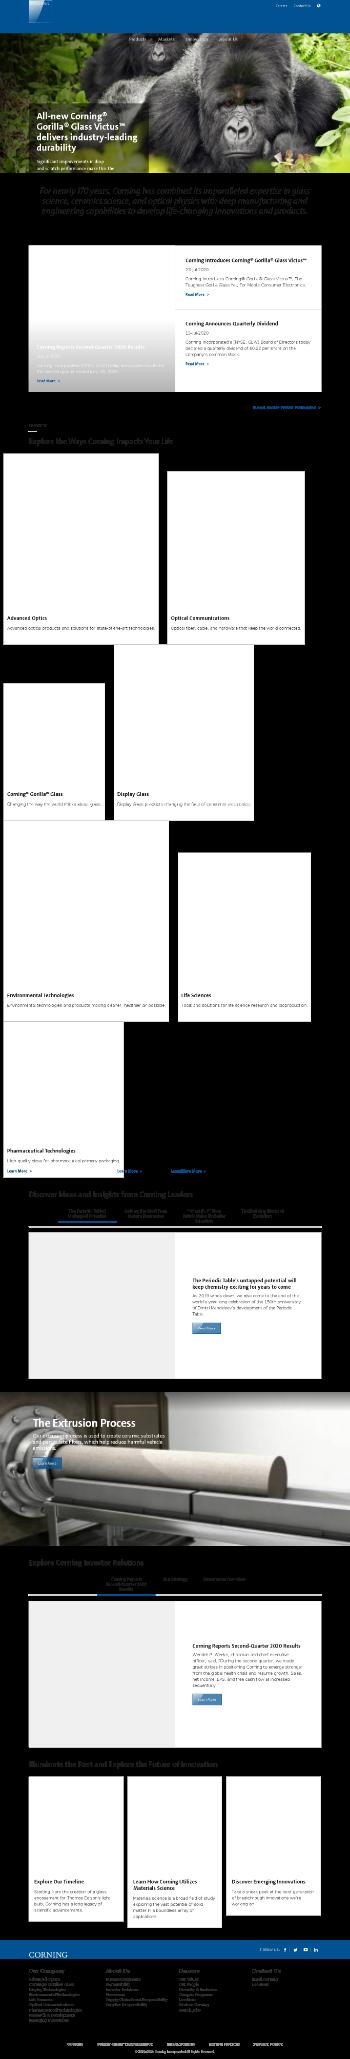 Corning Incorporated Website Screenshot